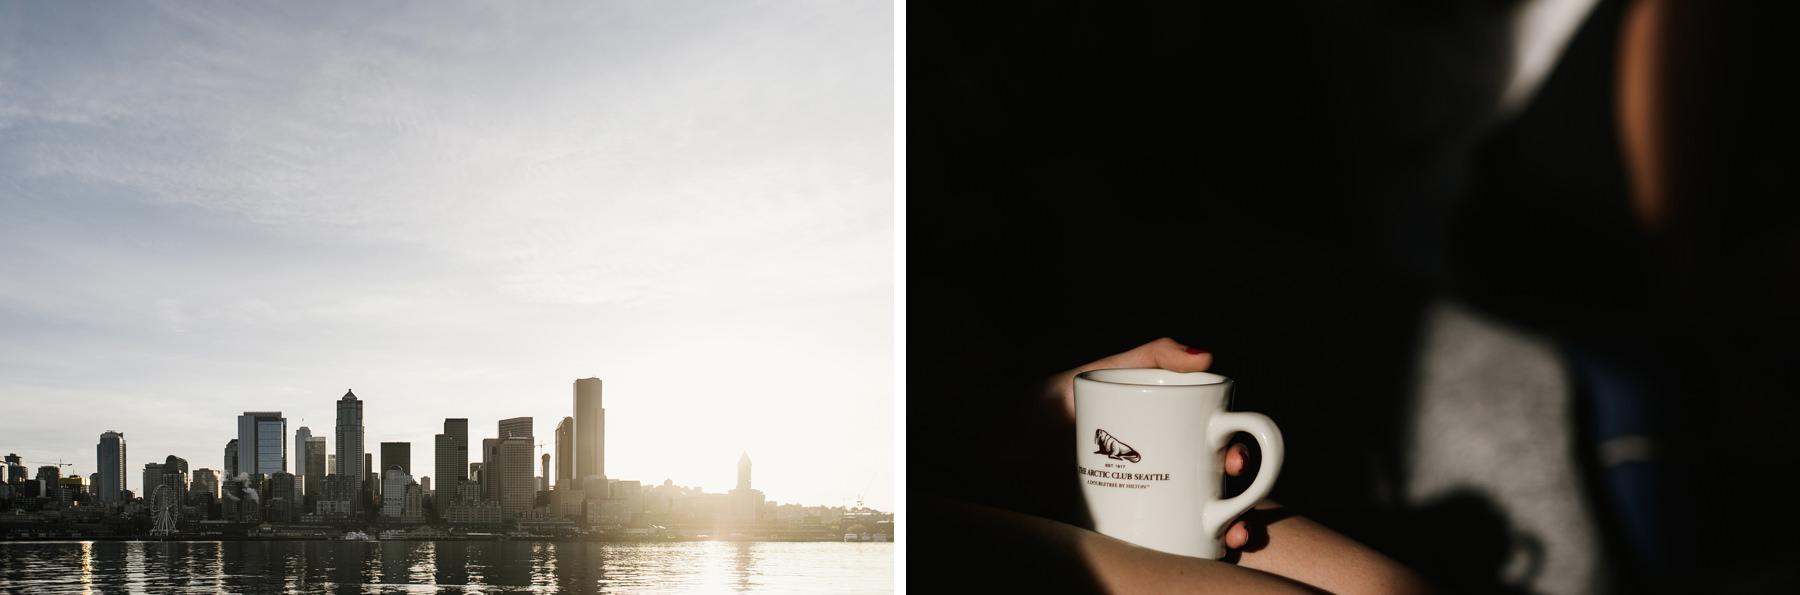 arctic-club-seattle-mug